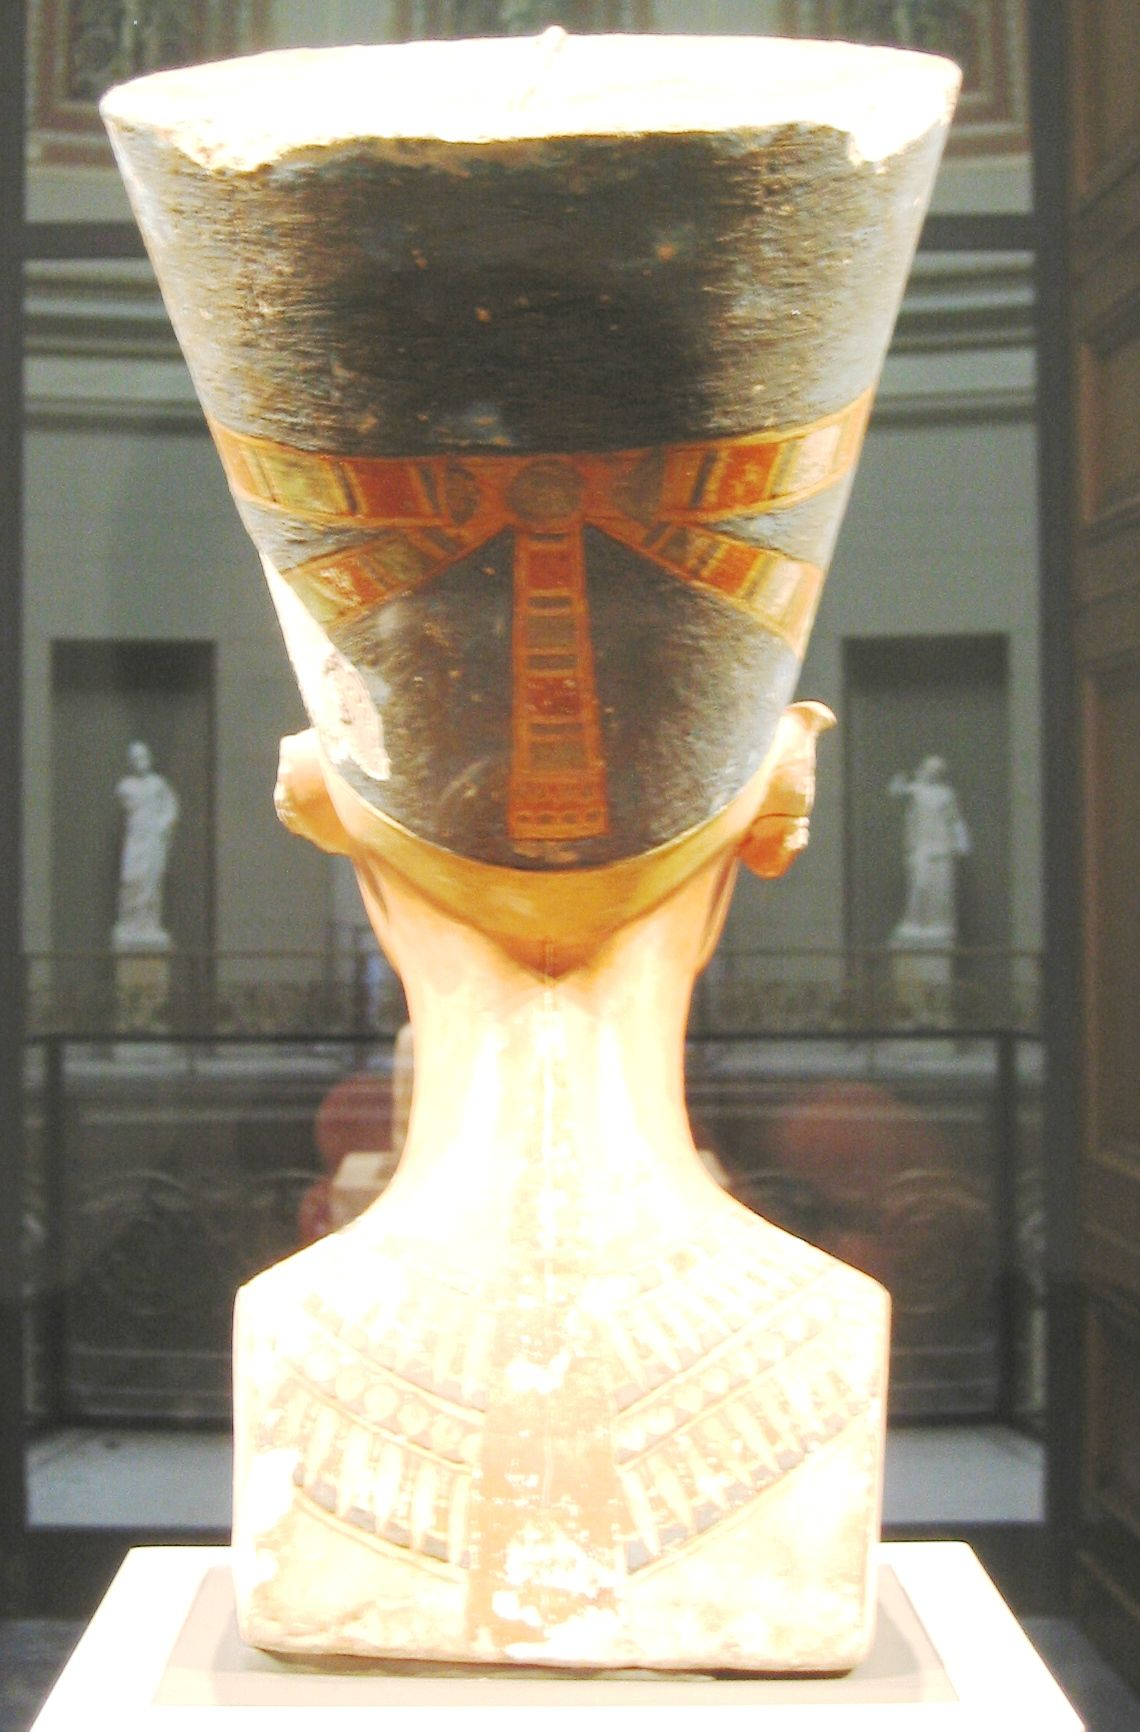 nefertiti - Google Search | Egypt Nefertiti Queen of Akhetaten